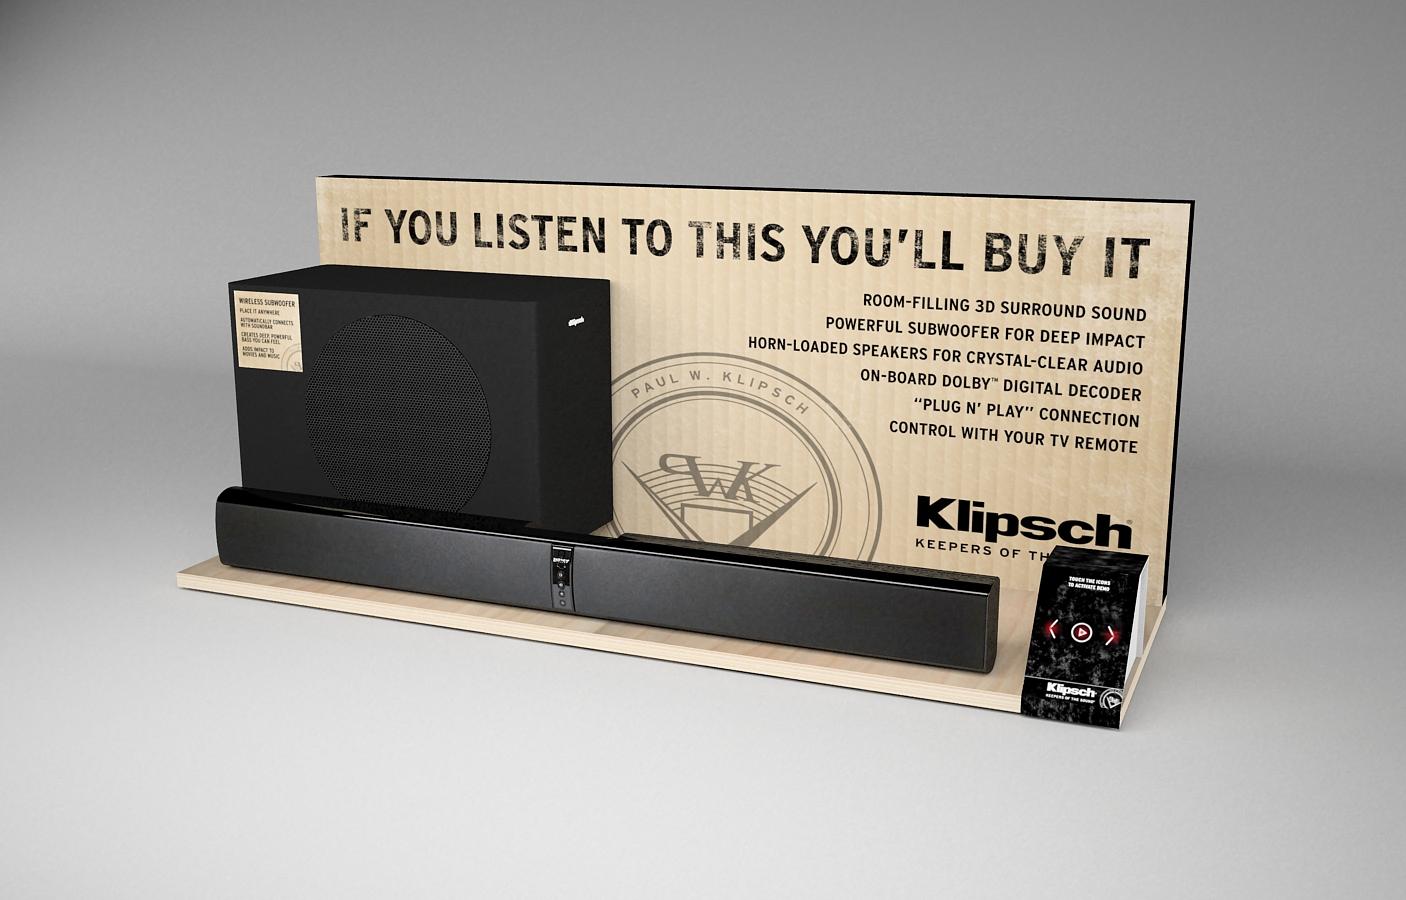 Klipsch Soundbar Display 03-11-14 5.jpg